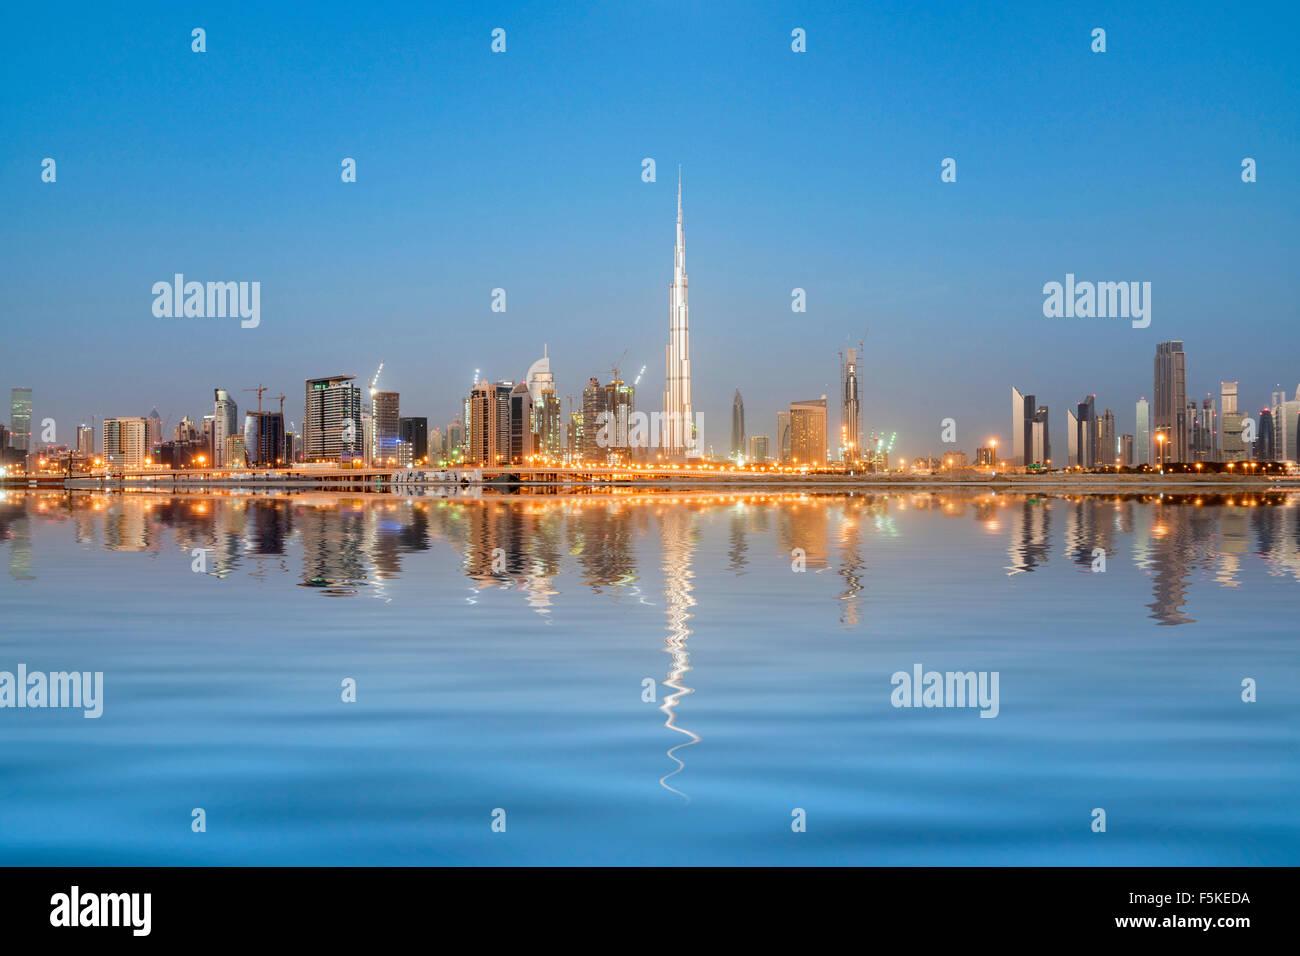 Skyline di torri si riflette nel torrente all'alba in Business Bay in Dubai Emirati Arabi Uniti Foto Stock